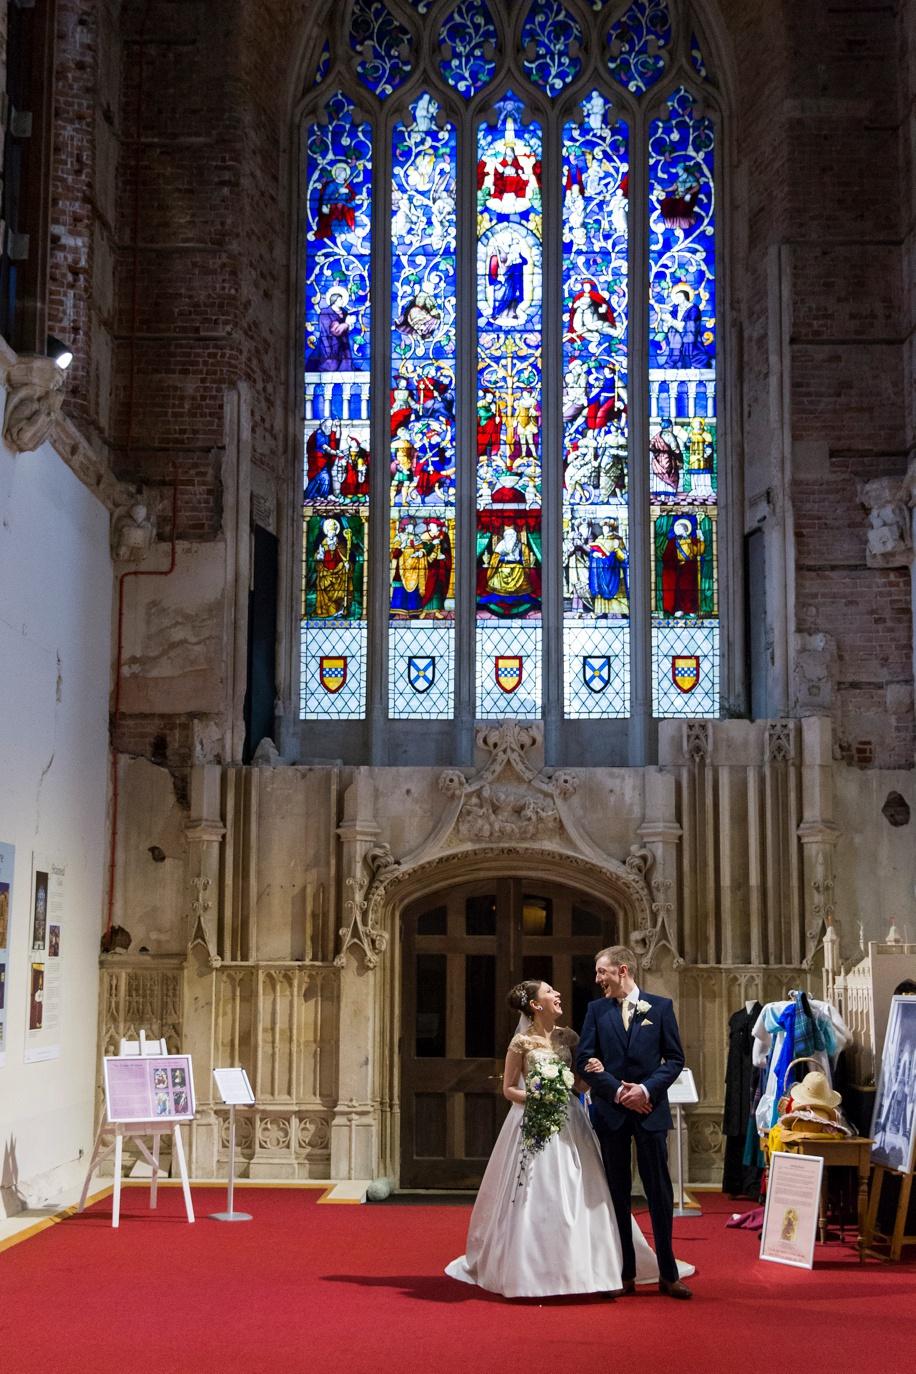 Stunning wedding photographs - A Bride's entrance at a Highcliffe Castle wedding